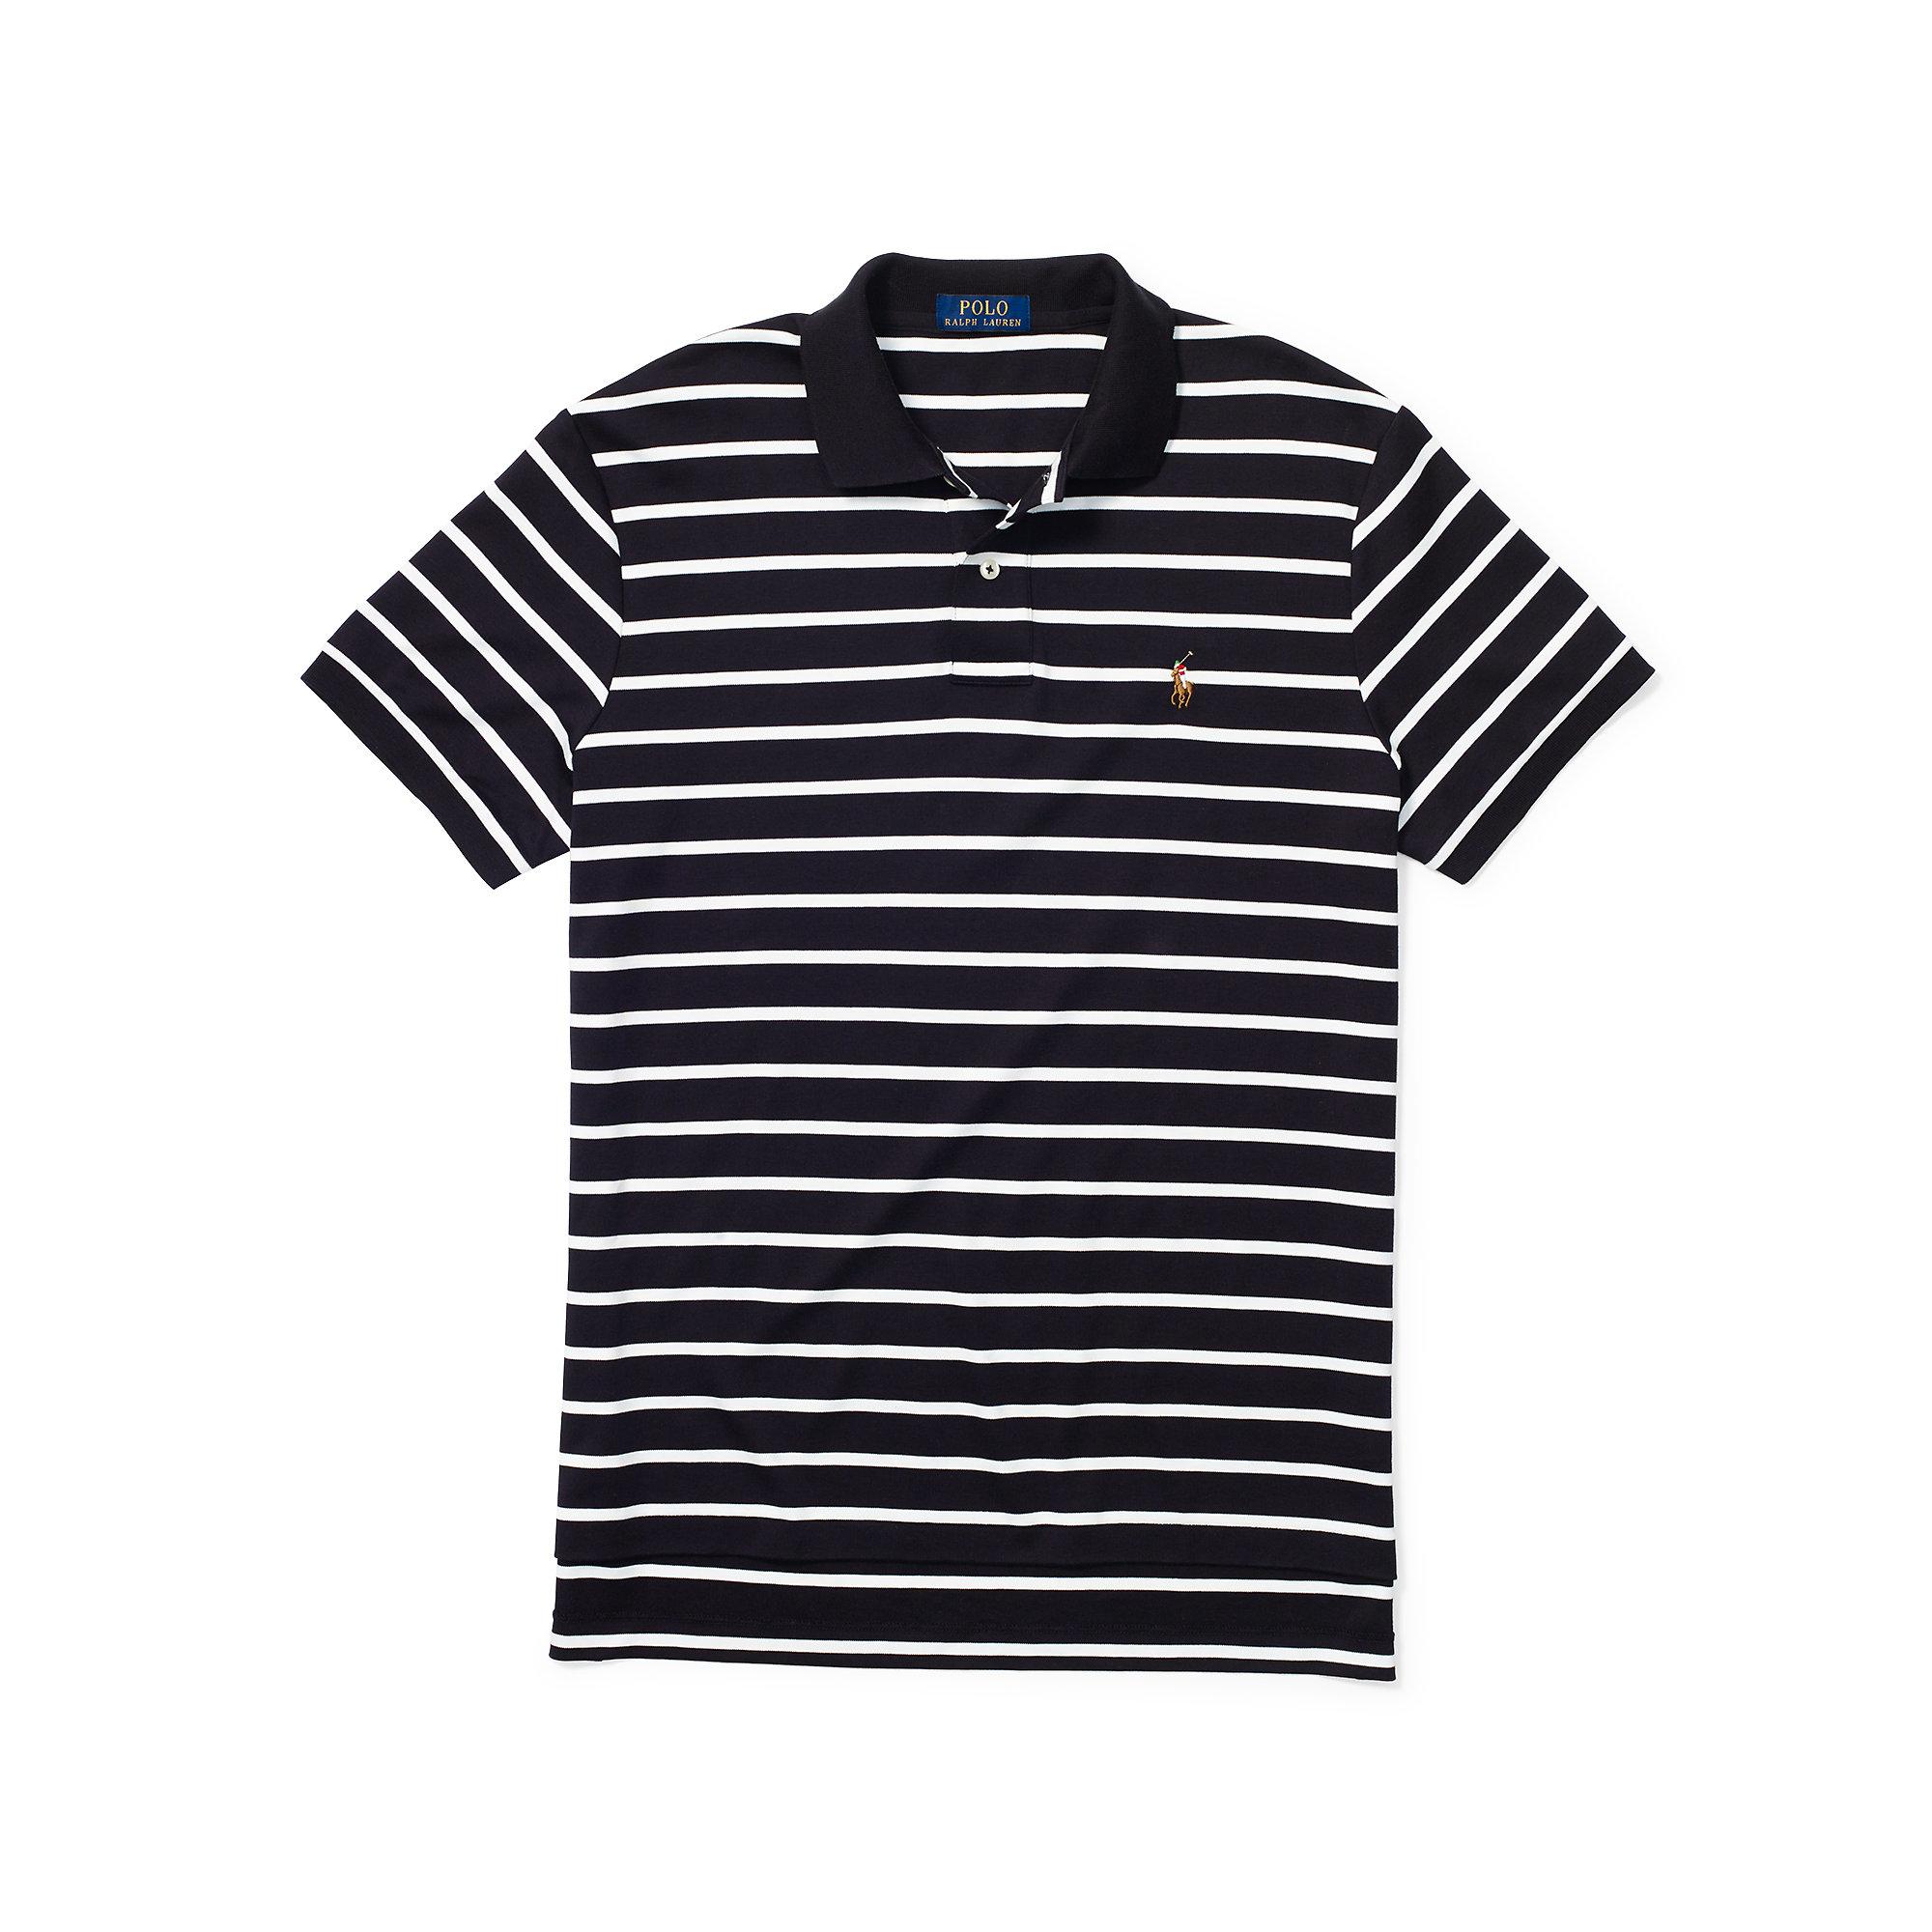 Men Pima Touch Black For Ralph Polo Soft Striped Lauren vmnNOy8w0